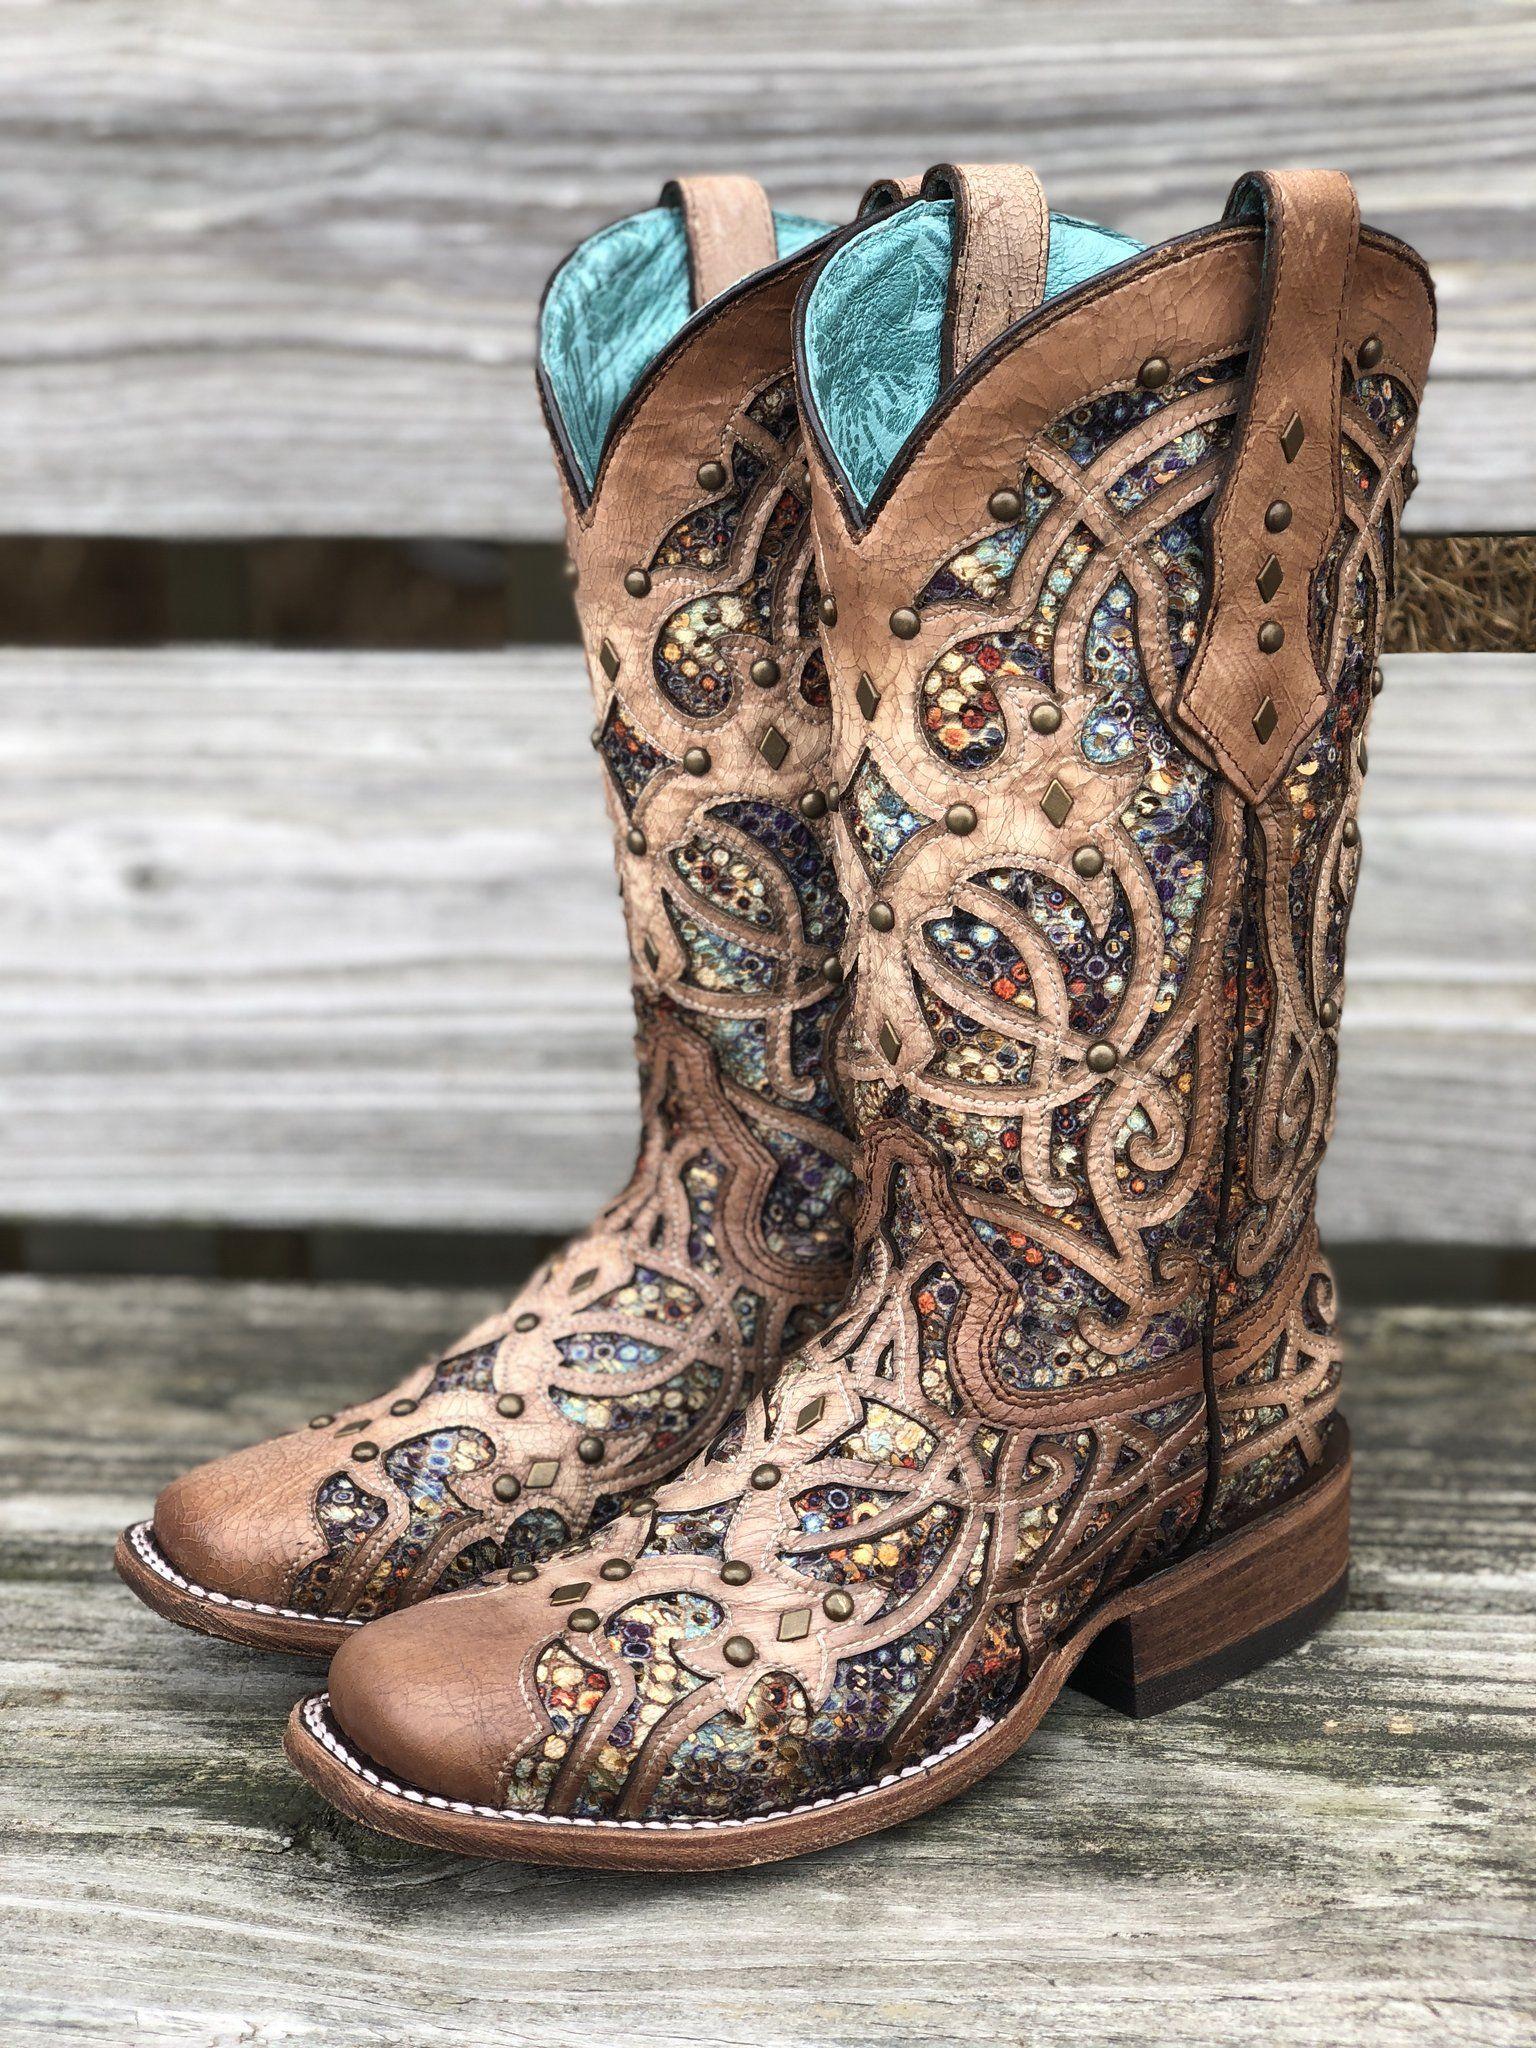 Corral Women's Bone & Multi Color Inlay Square Toe Western Boots C3405 2